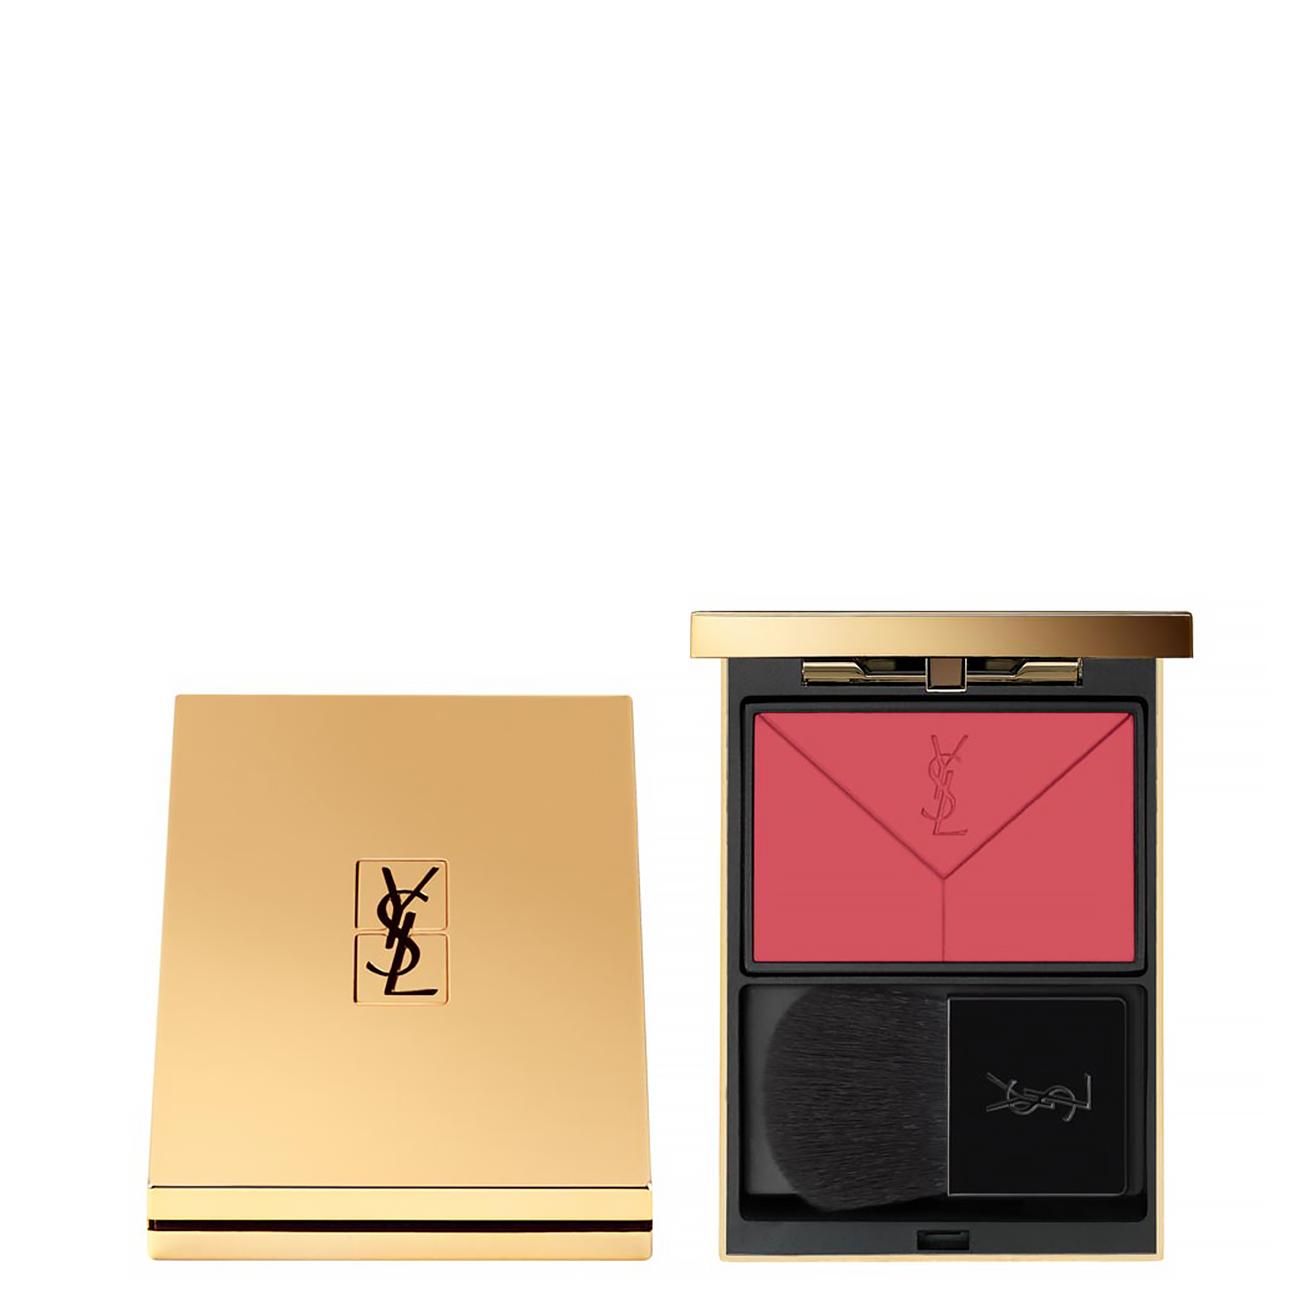 Couture Blush 2 Yves Saint Laurent imagine 2021 bestvalue.eu